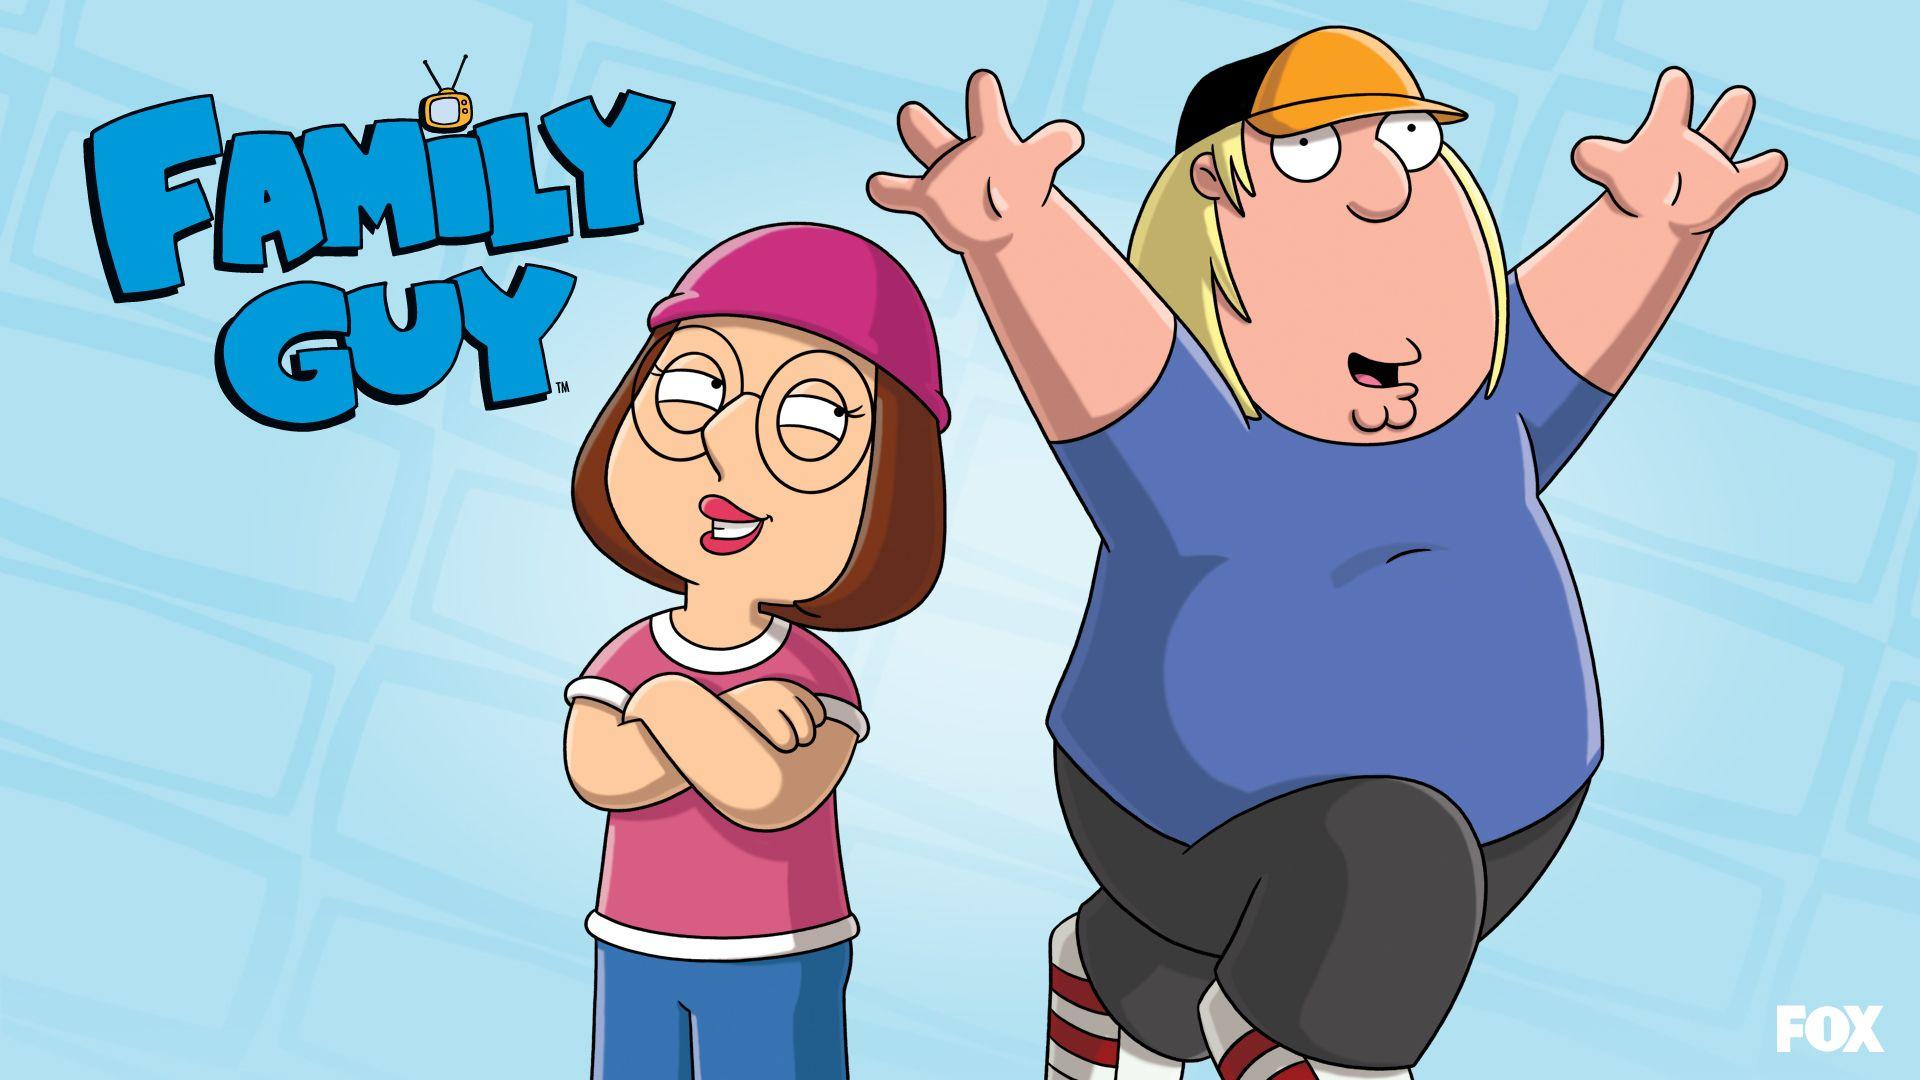 Family Guy Meg Meg family guy, Family guy, Guys